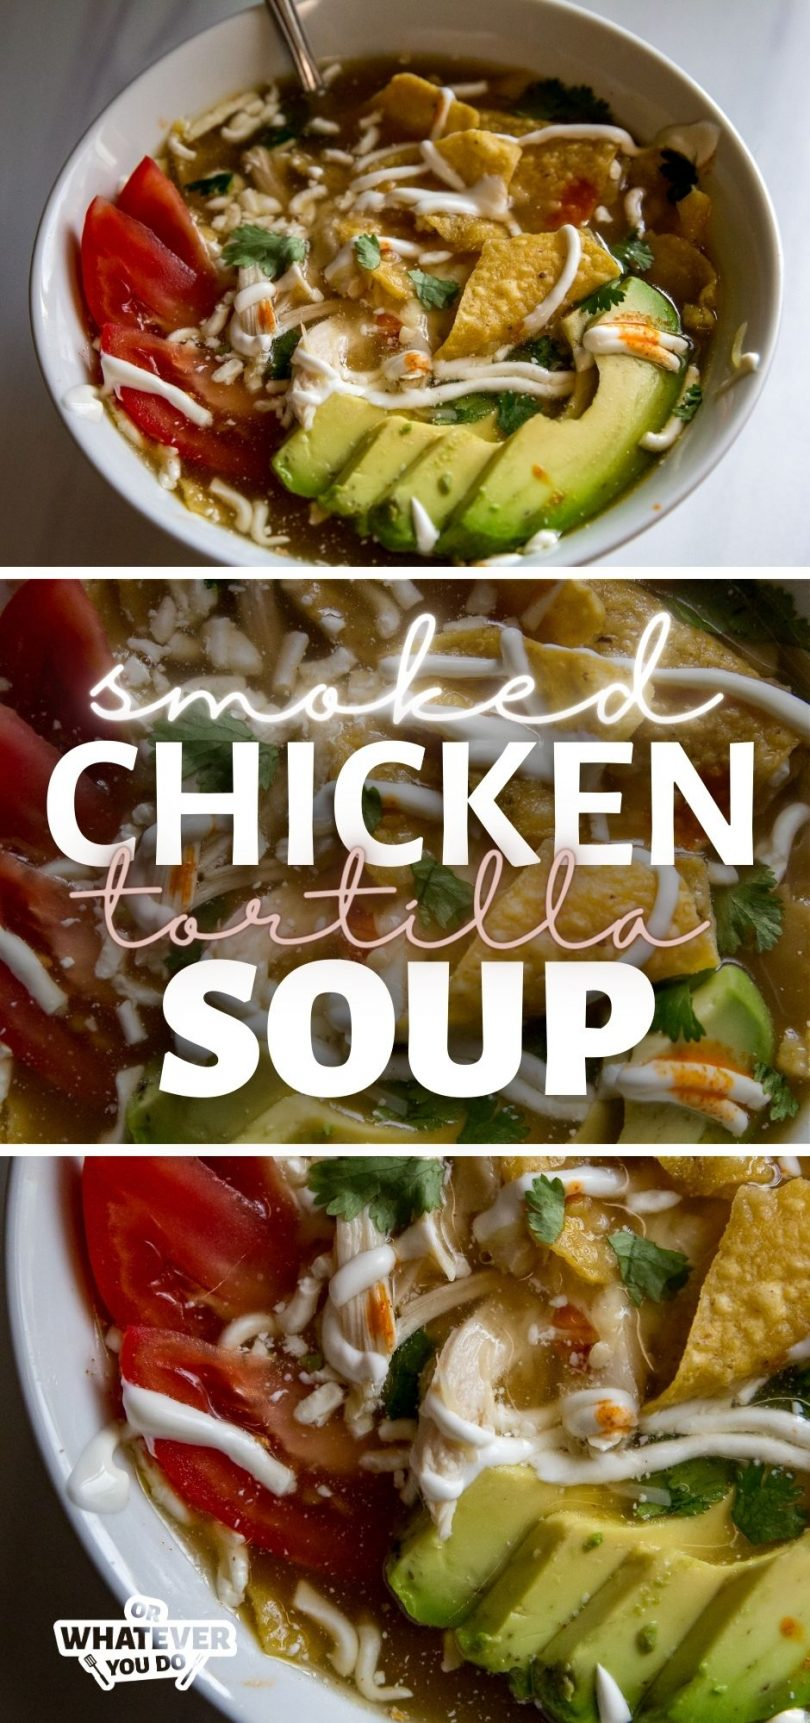 Smoked Chicken Tortilla Soup